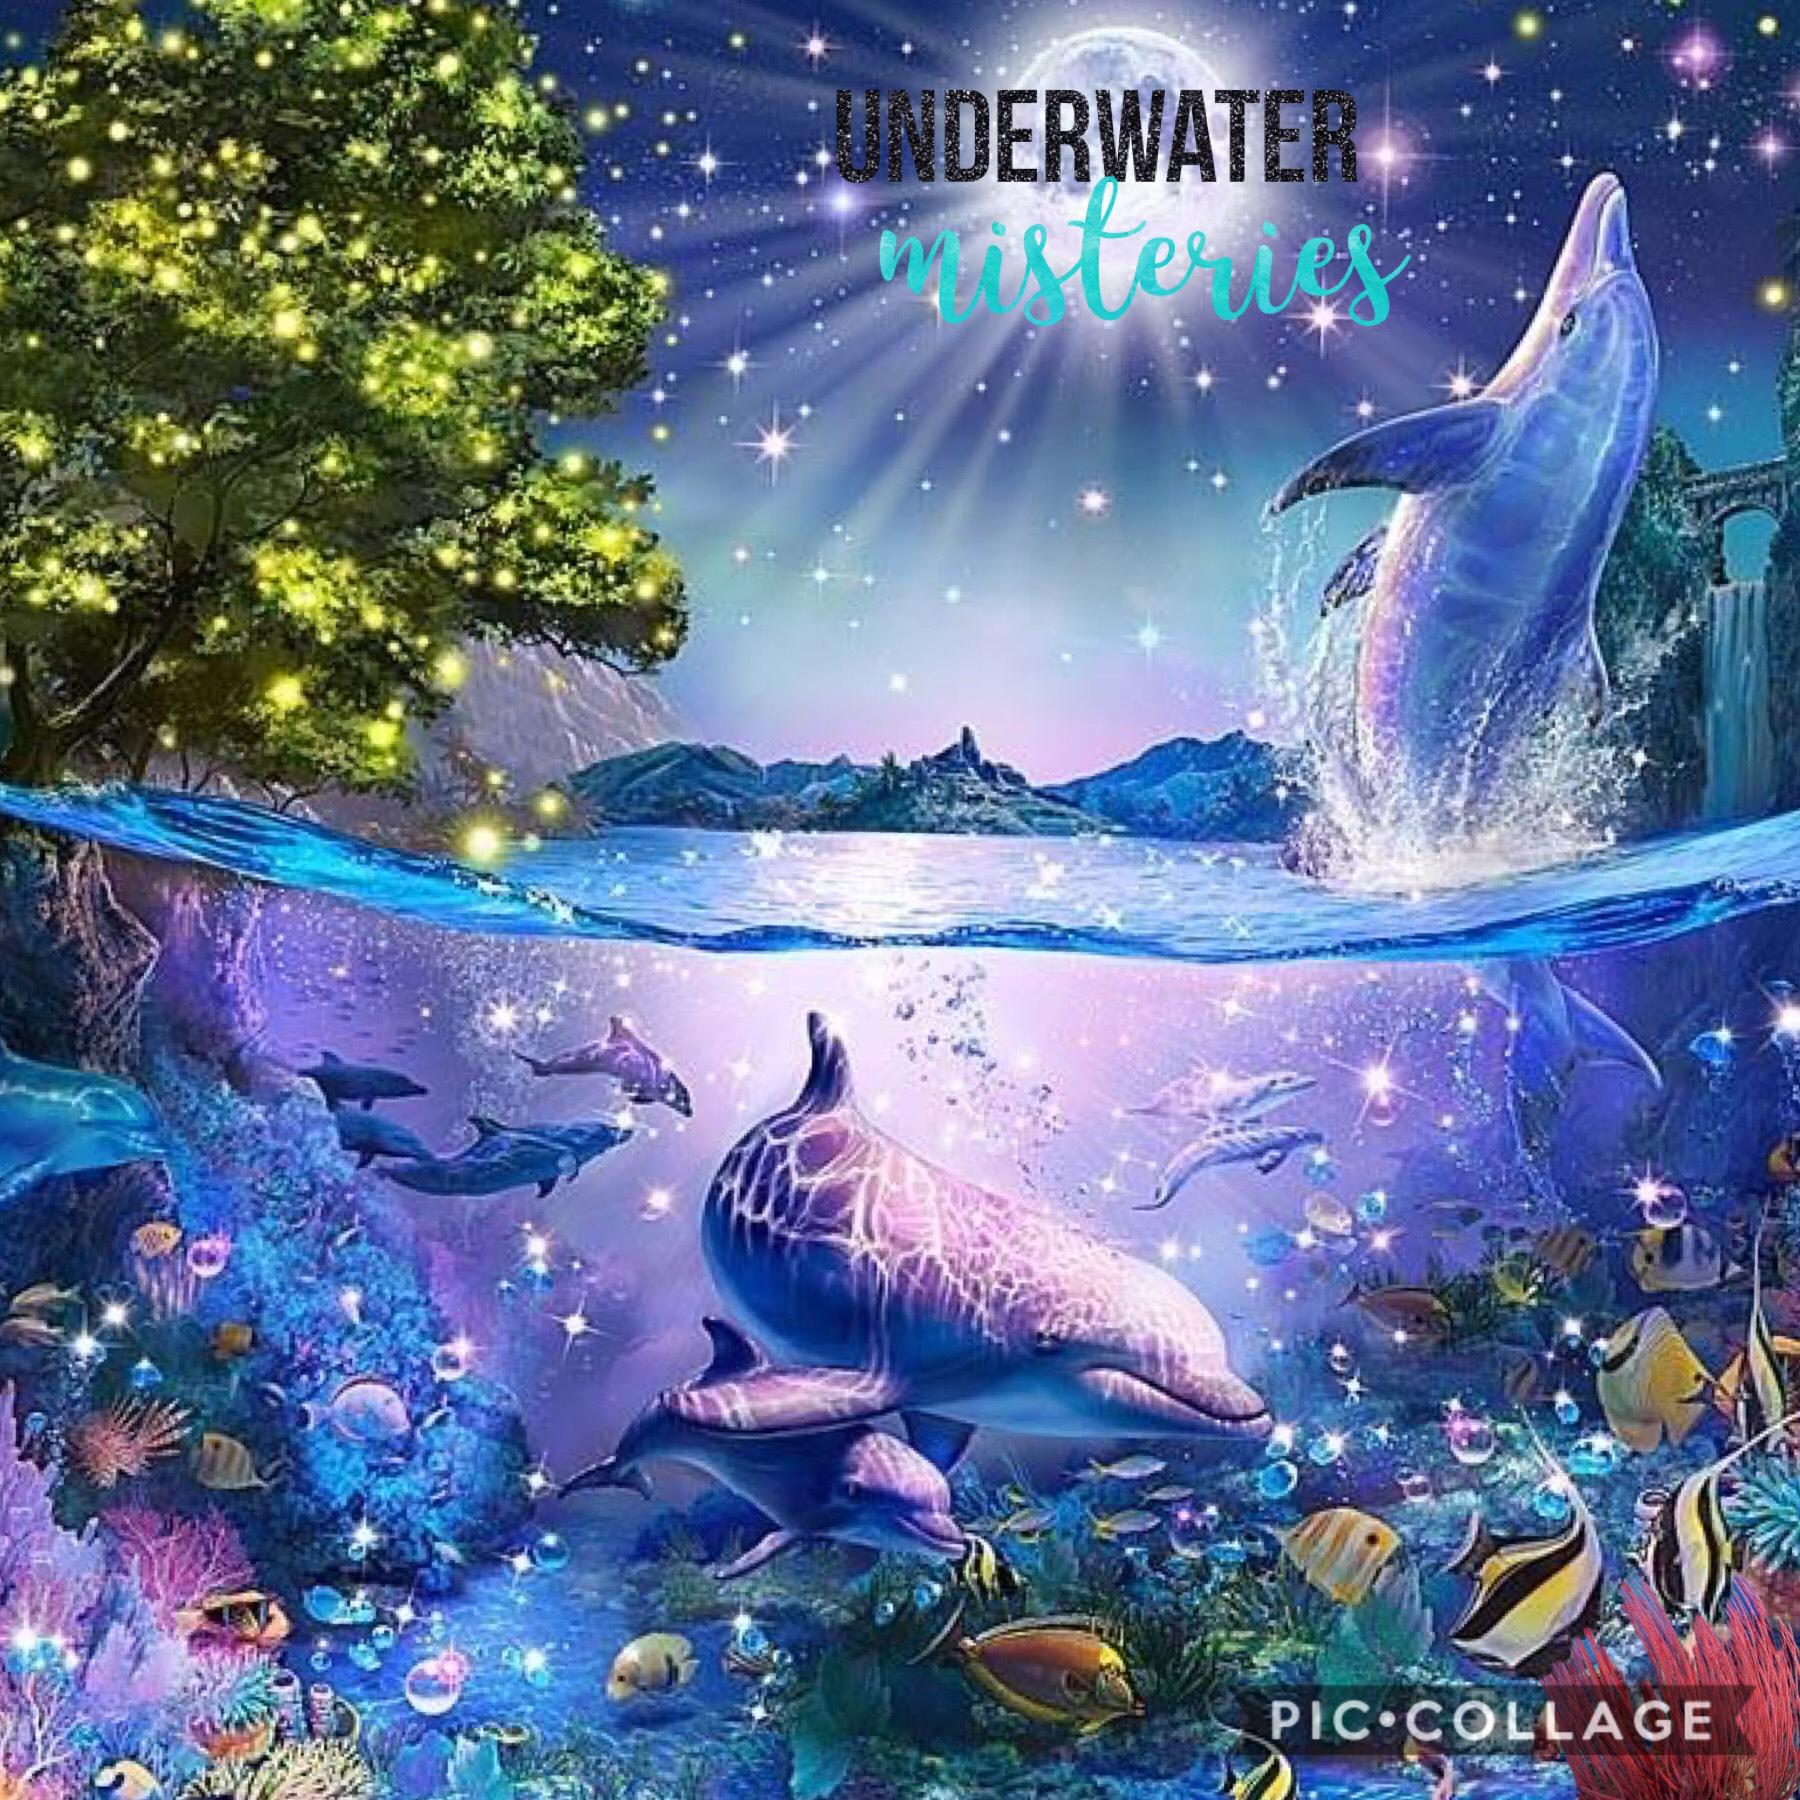 #underwatermisteries